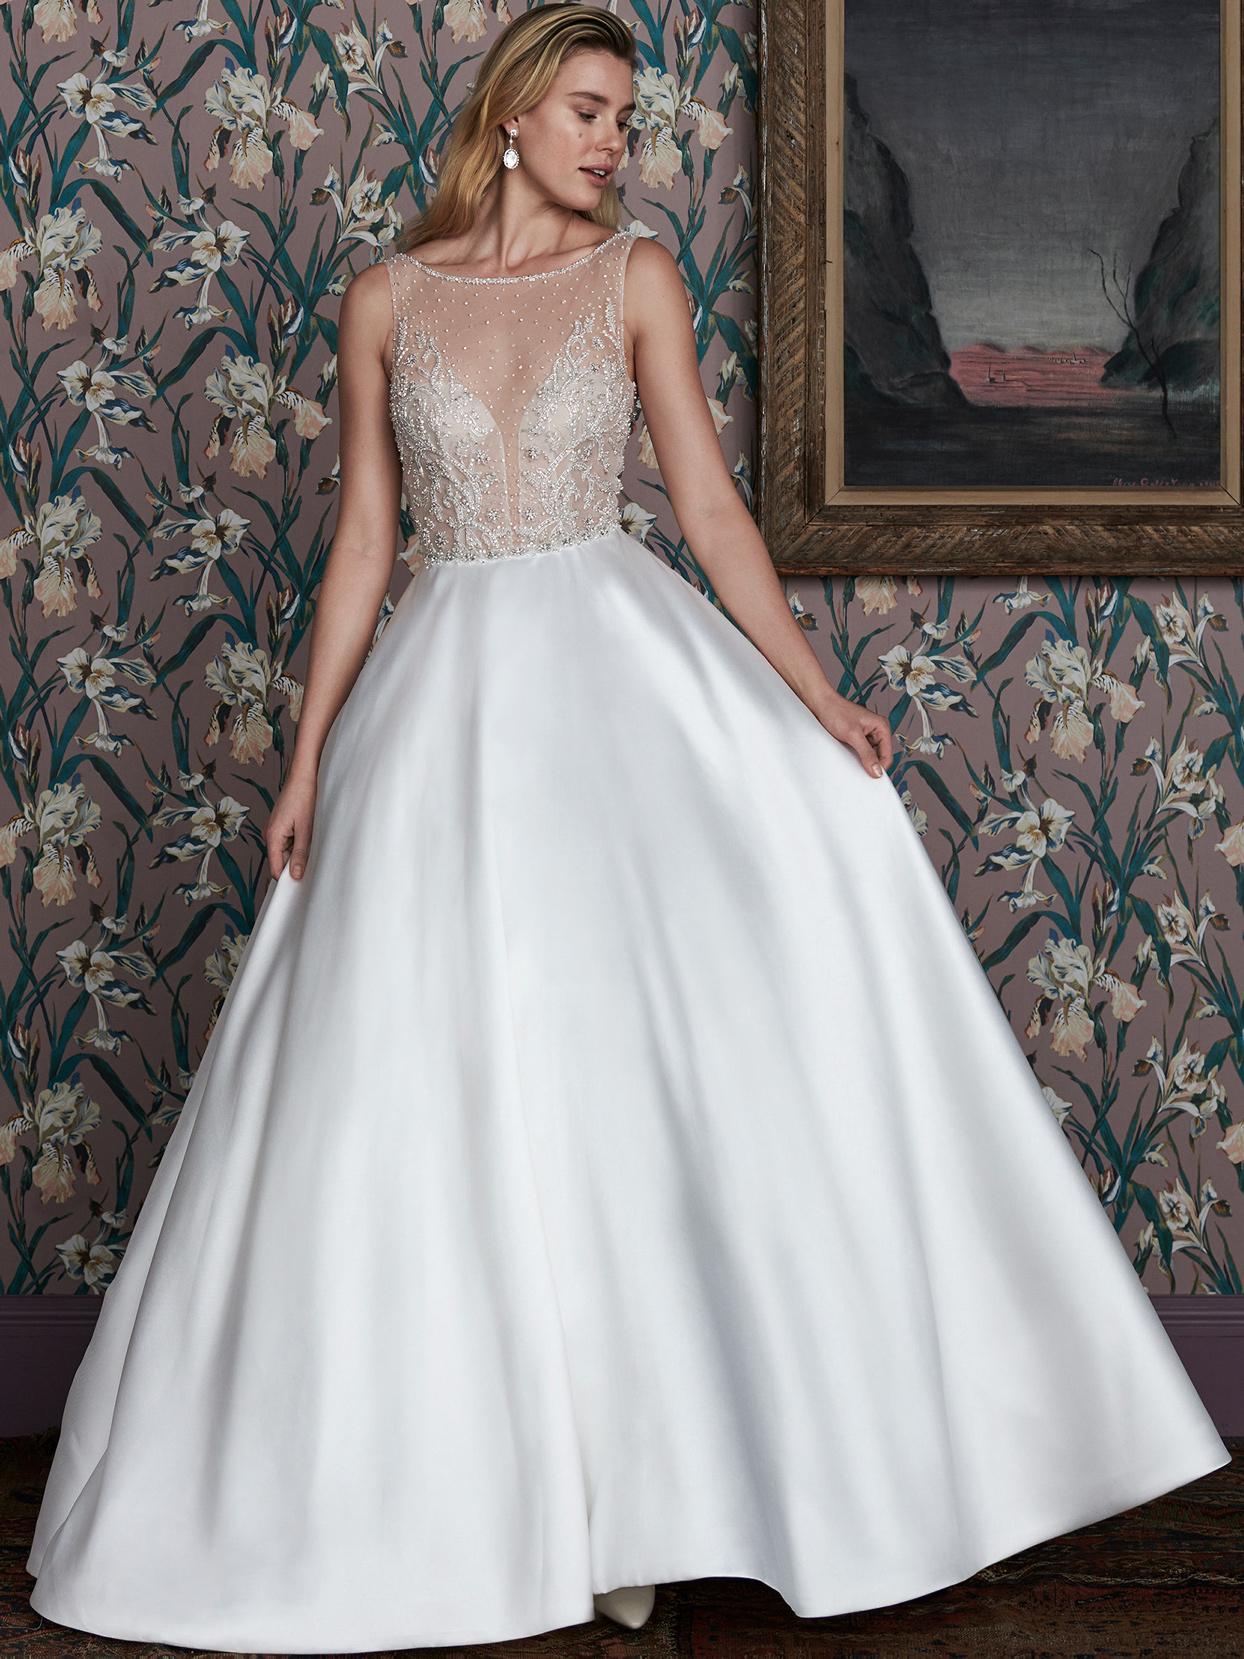 justin alexander illusion high neck sleeveless wedding dress spring 2021